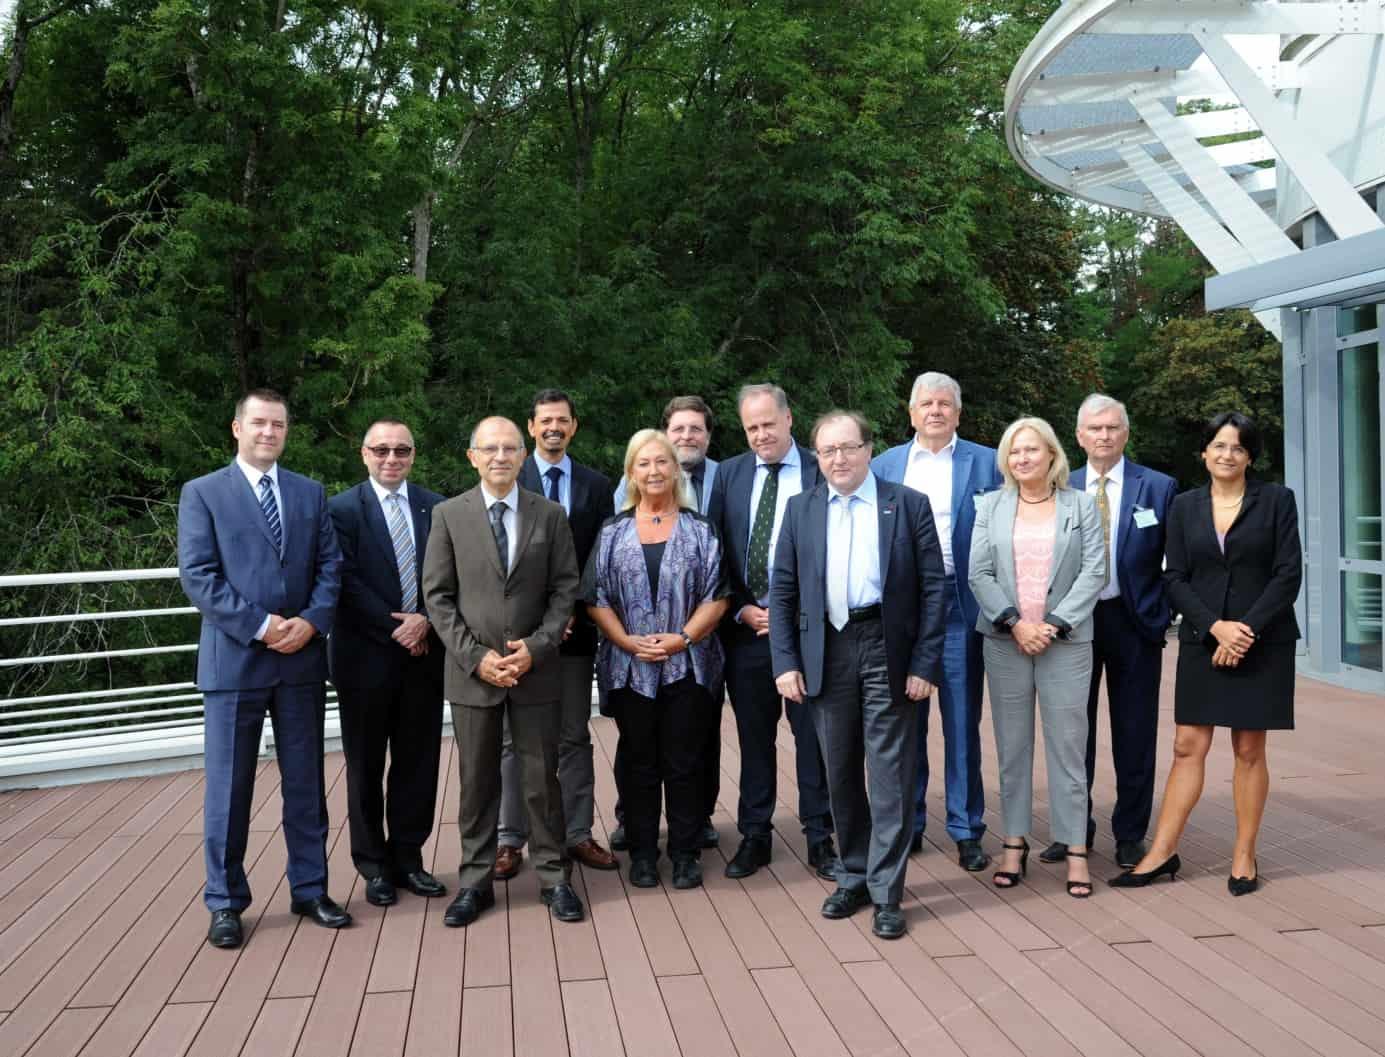 ONERA 70th anniversary and EREA Board Internal Strategy Seminar in Paris